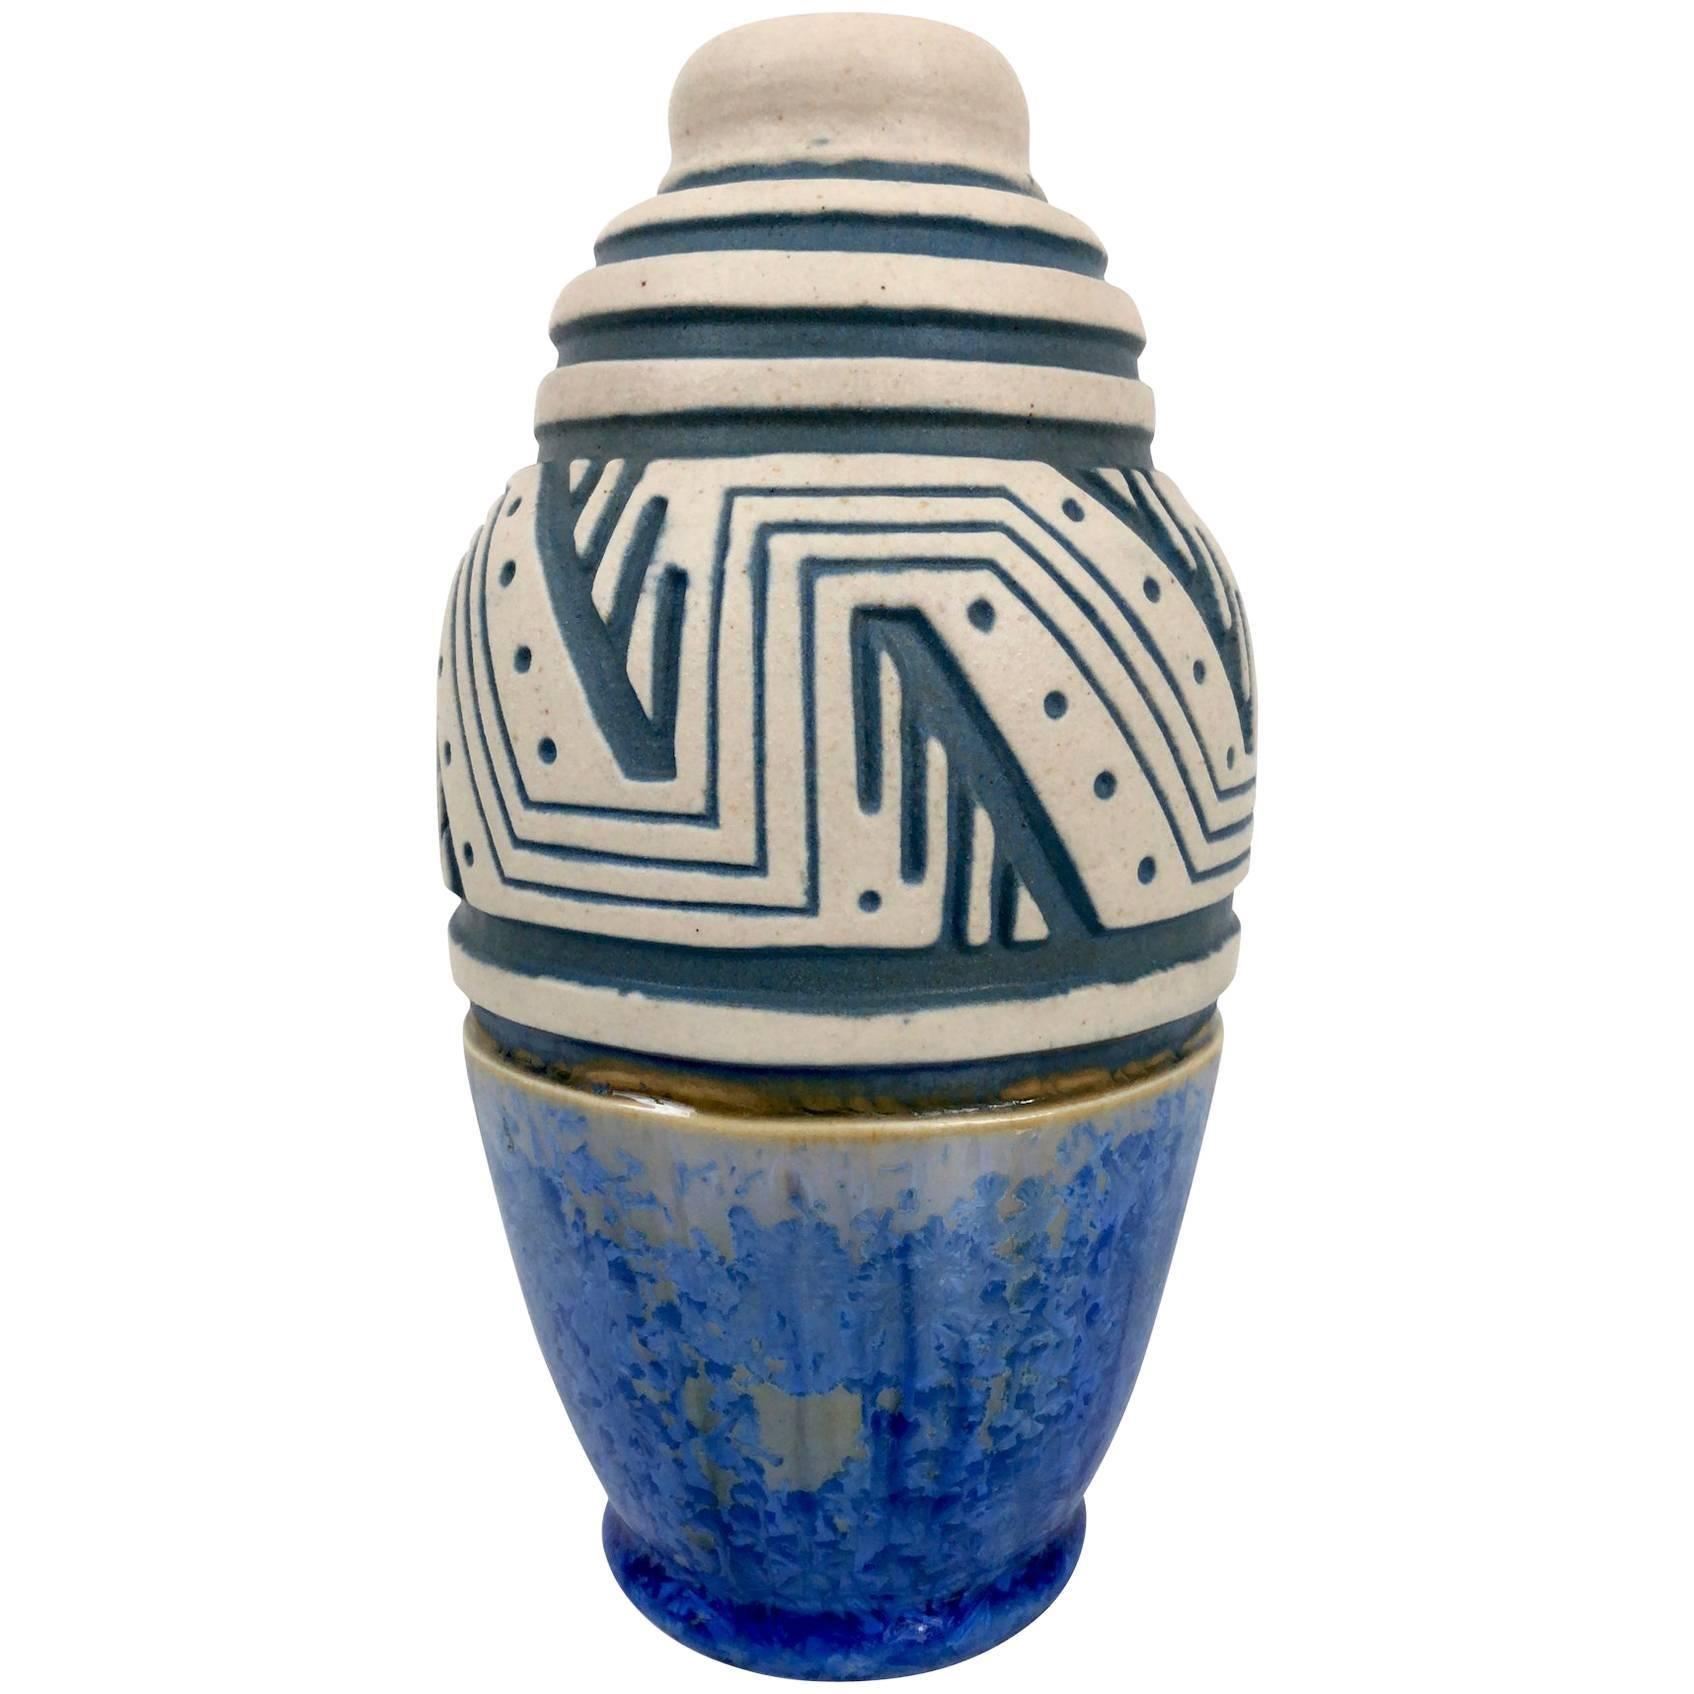 Glazed Ceramic Vase by Mougin, Art Deco, France, 1930s